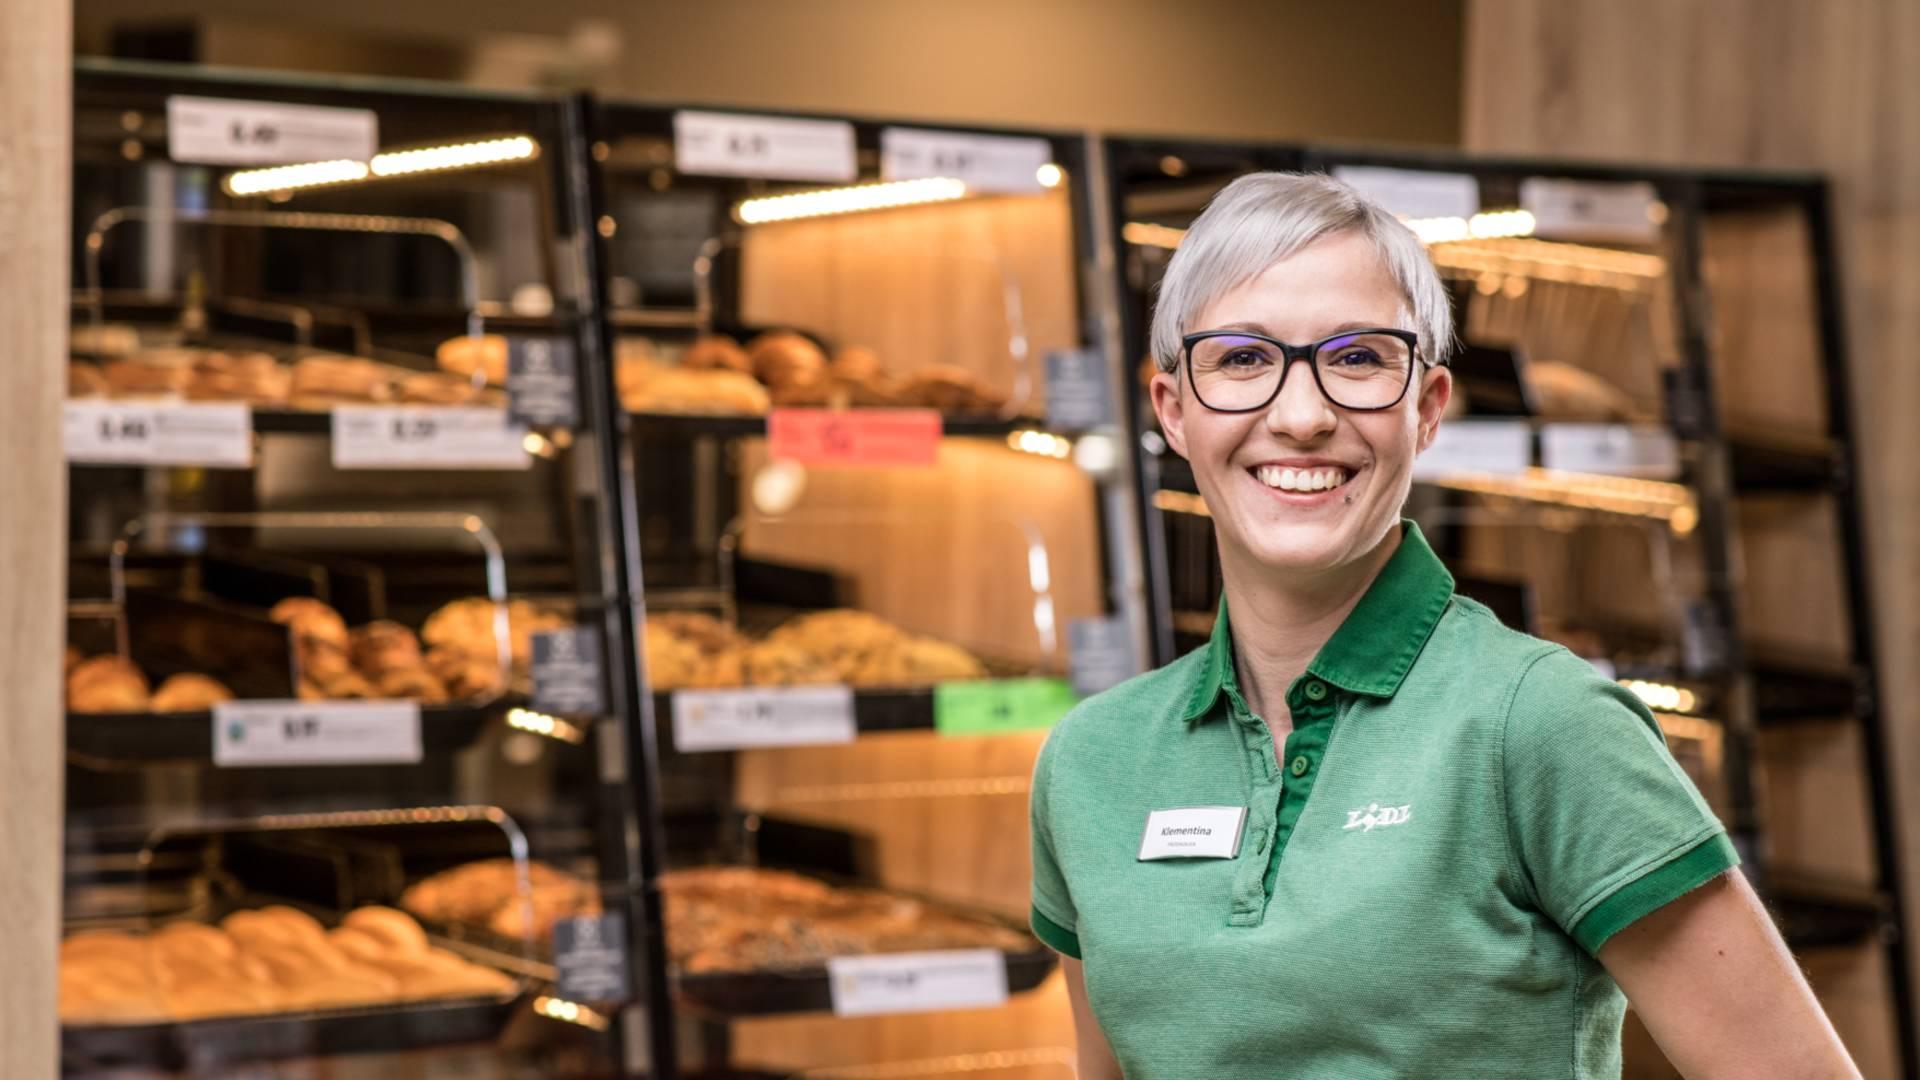 prodaja-pekarna-portret